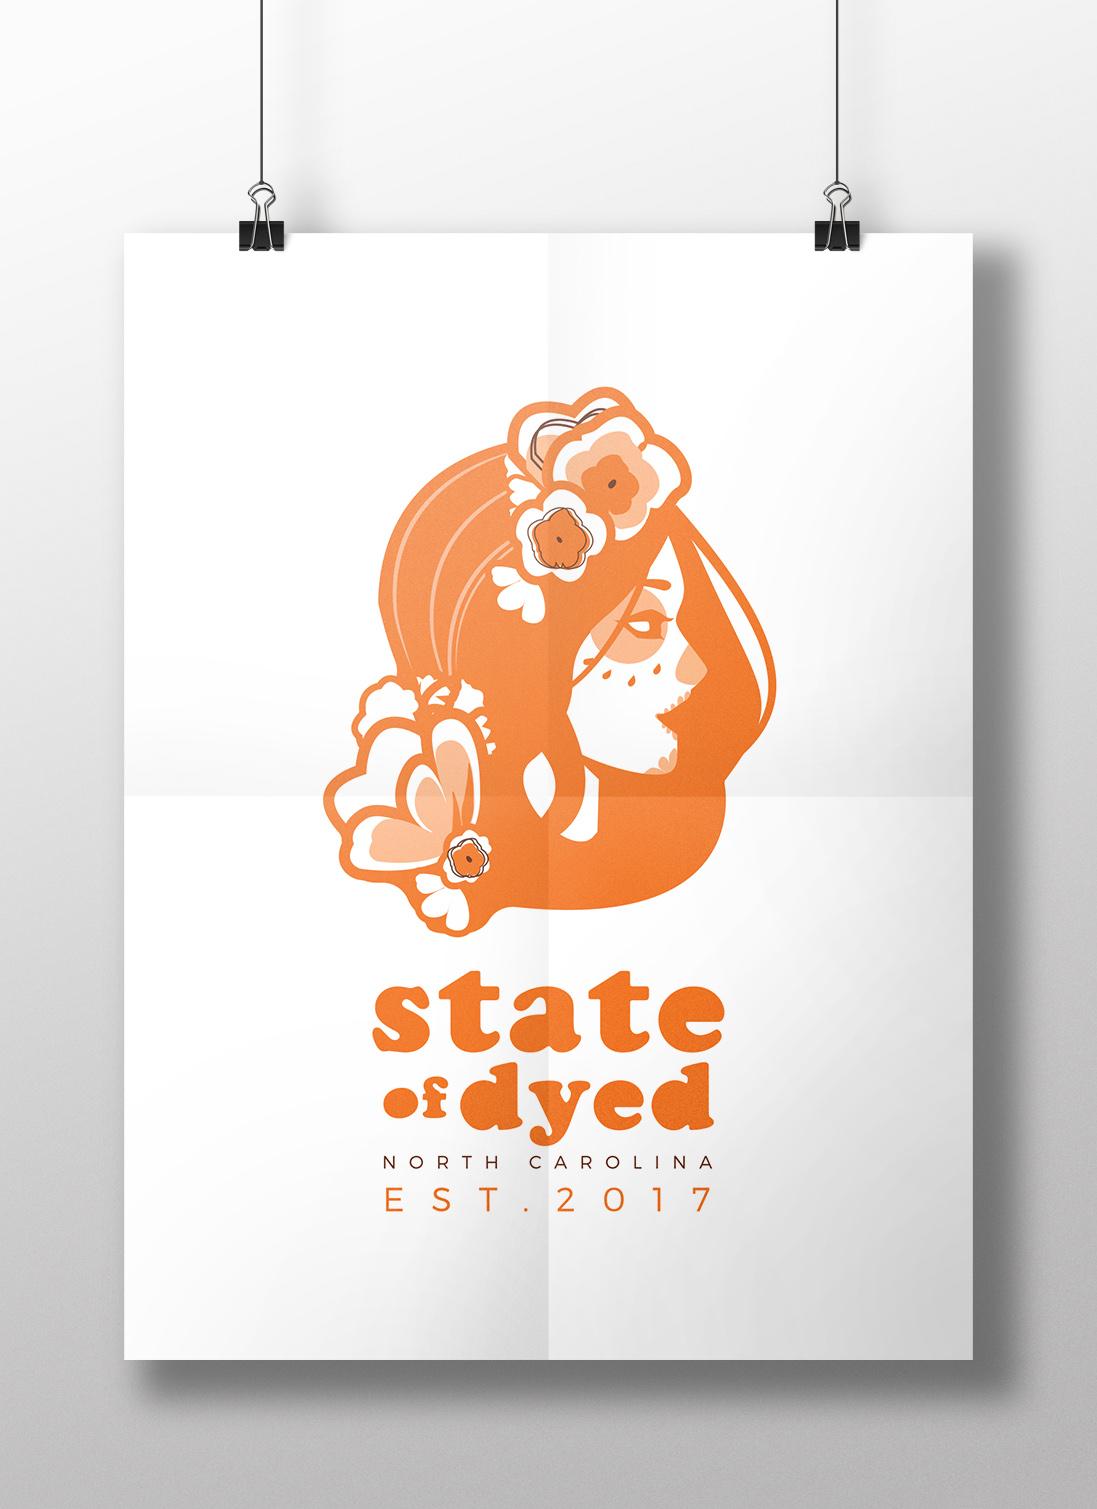 StateofDyed-Poster.jpg